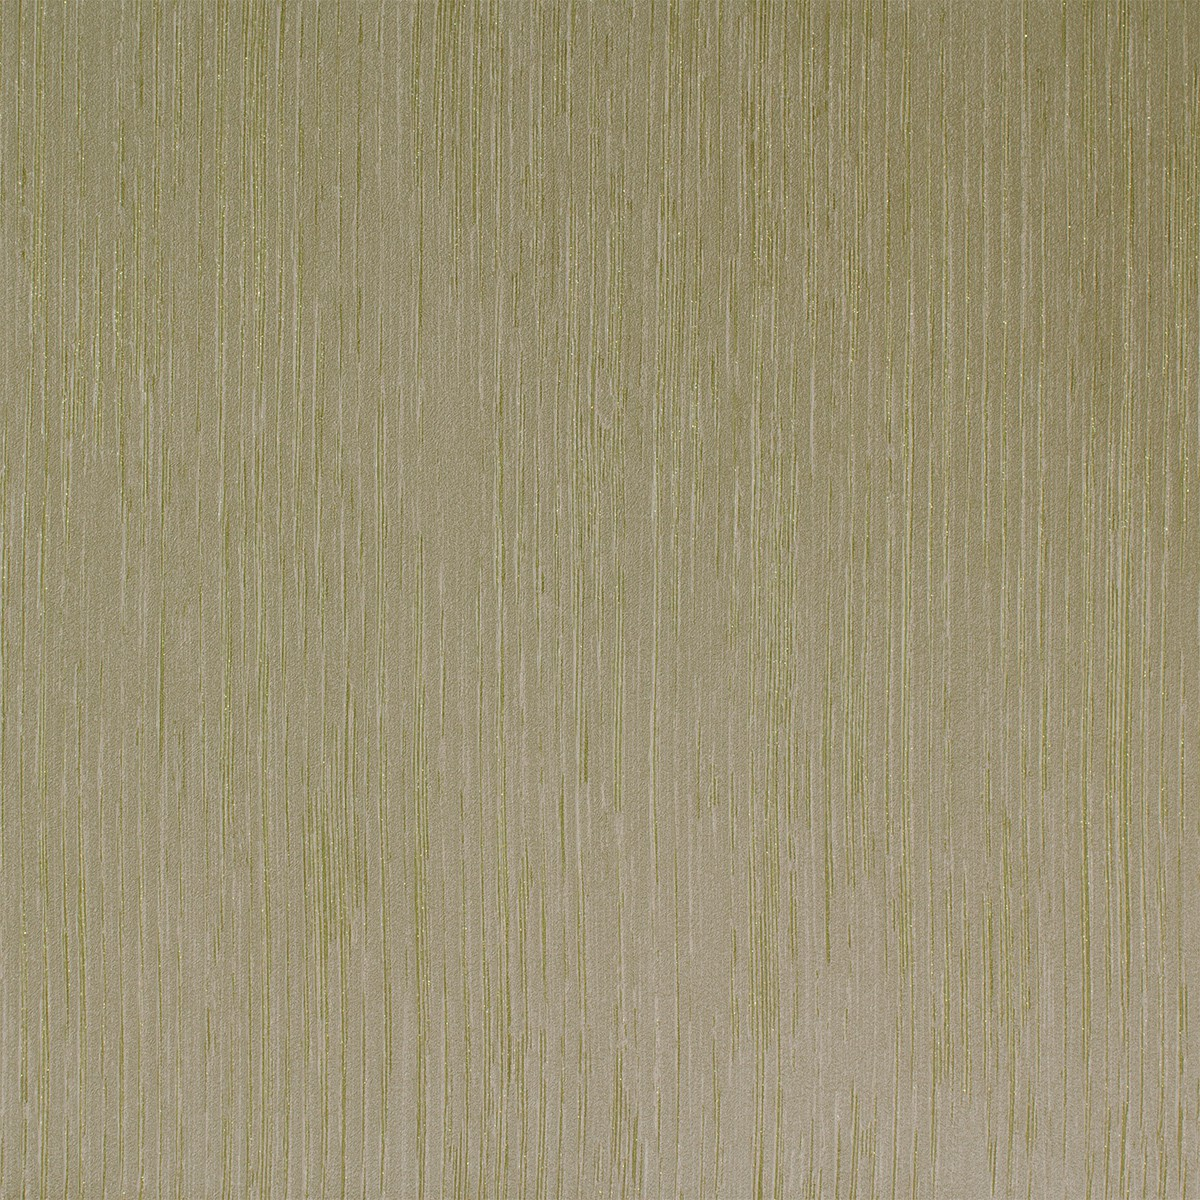 tapete uni streifen grau gr n gold tapeten rasch textil angelica 009585. Black Bedroom Furniture Sets. Home Design Ideas